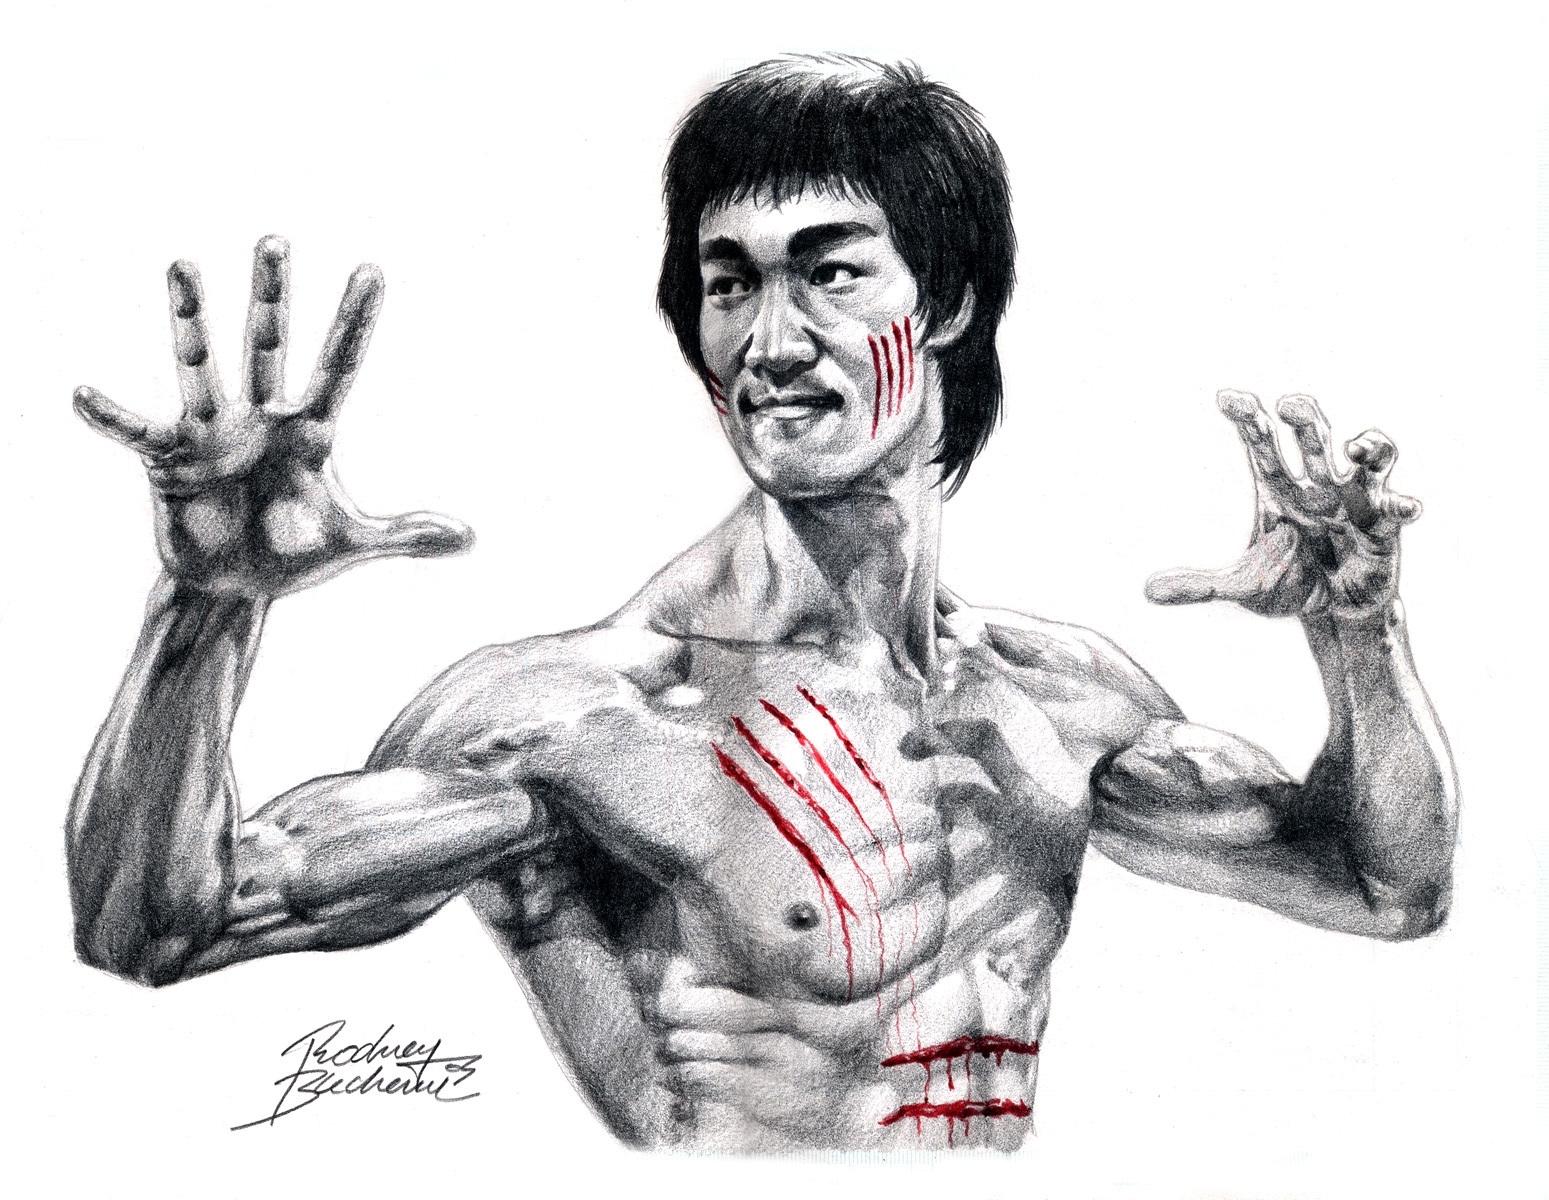 10 New Bruce Lee Hd Wallpaper FULL HD 1920×1080 For PC ...